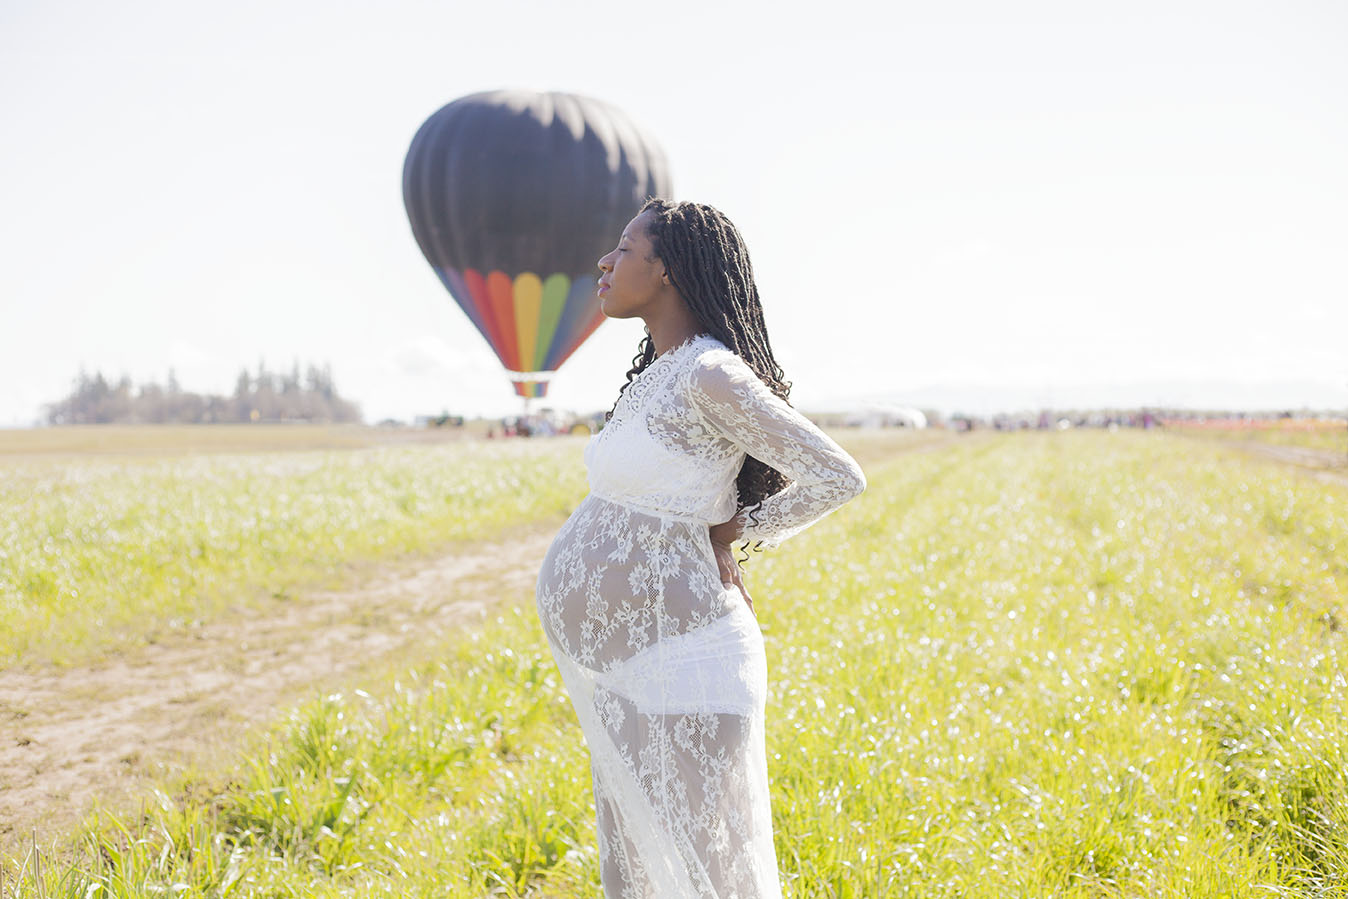 dc66ec5efa47f romantic maternity photography hot air balloon - Beating Hearts ...